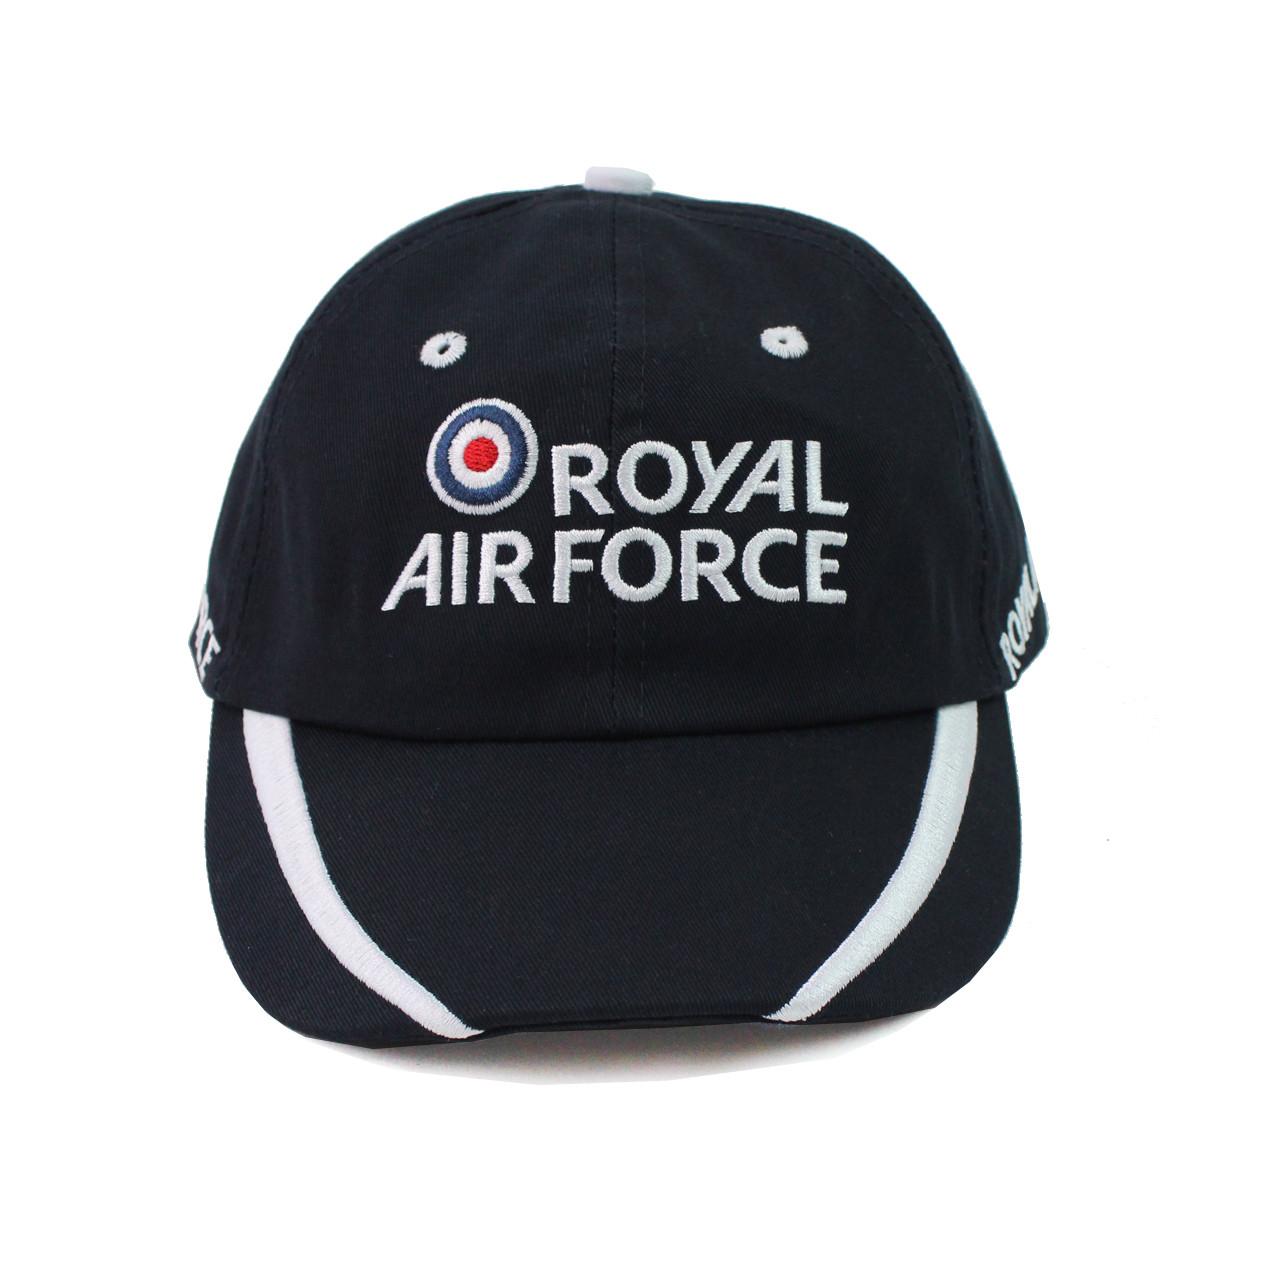 Official Royal Air Force Kids Embroidered Baseball Cap - Air Force ... d397b9d982b